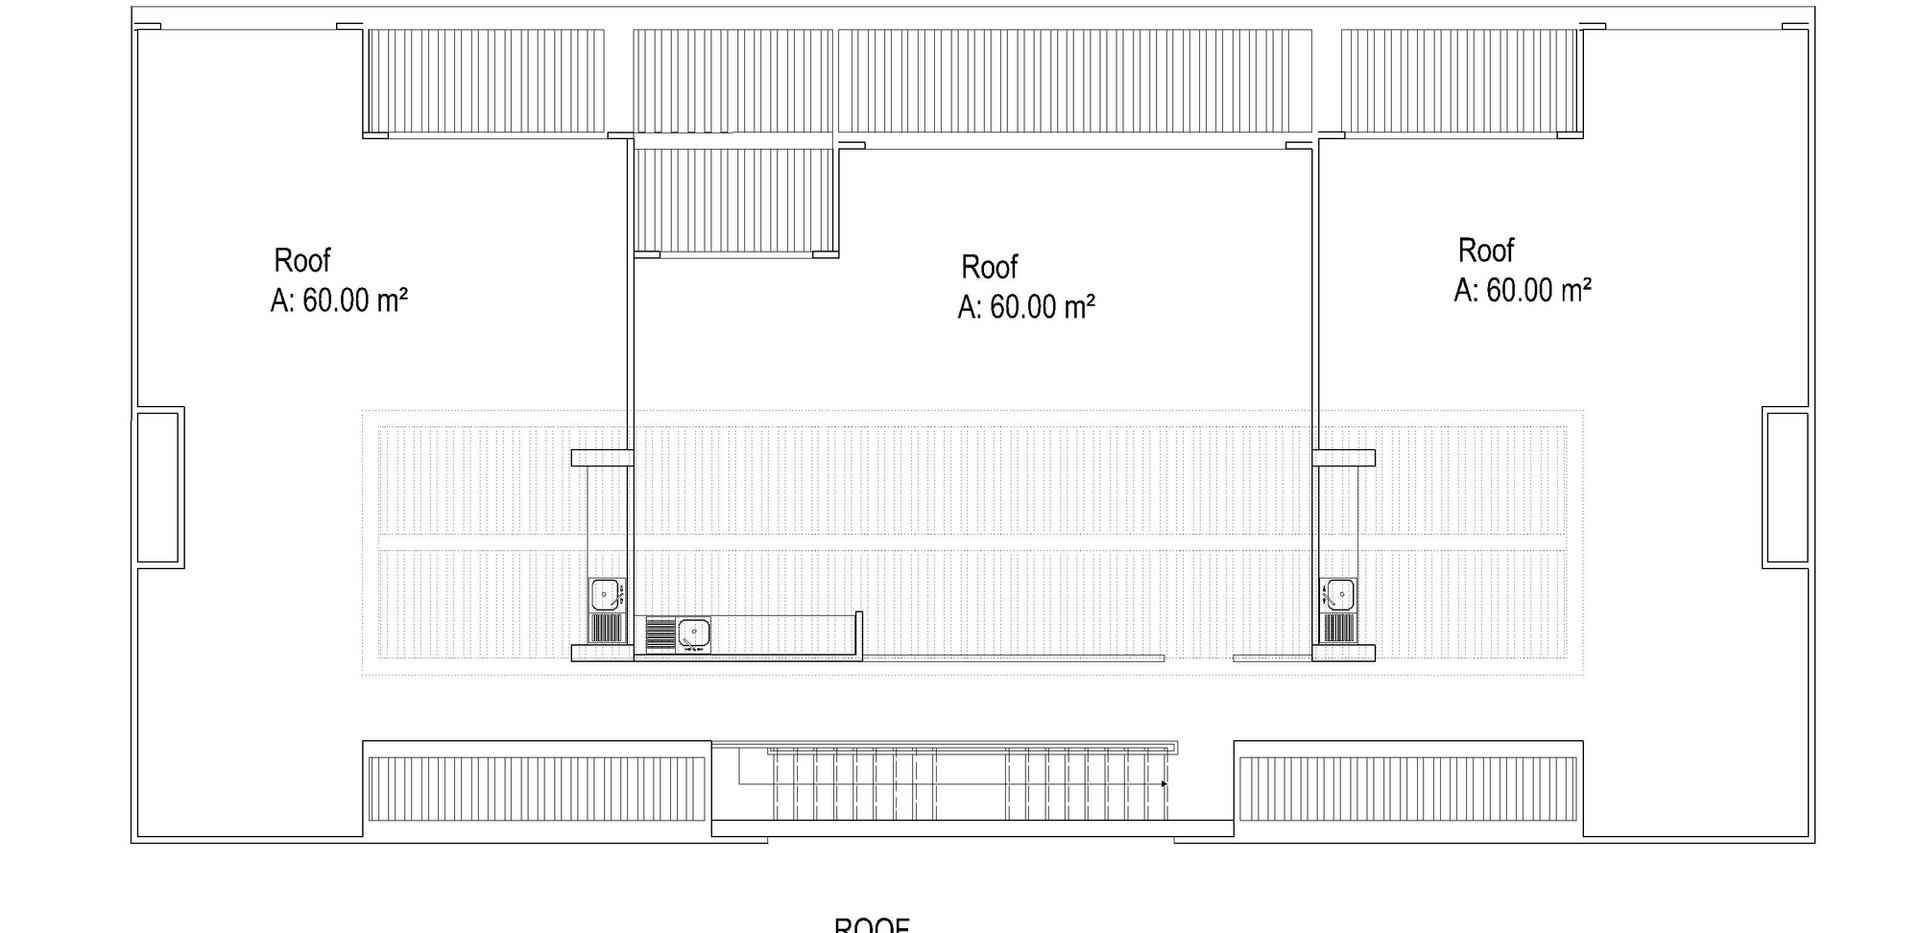 Roof Terrace Plan.jpg